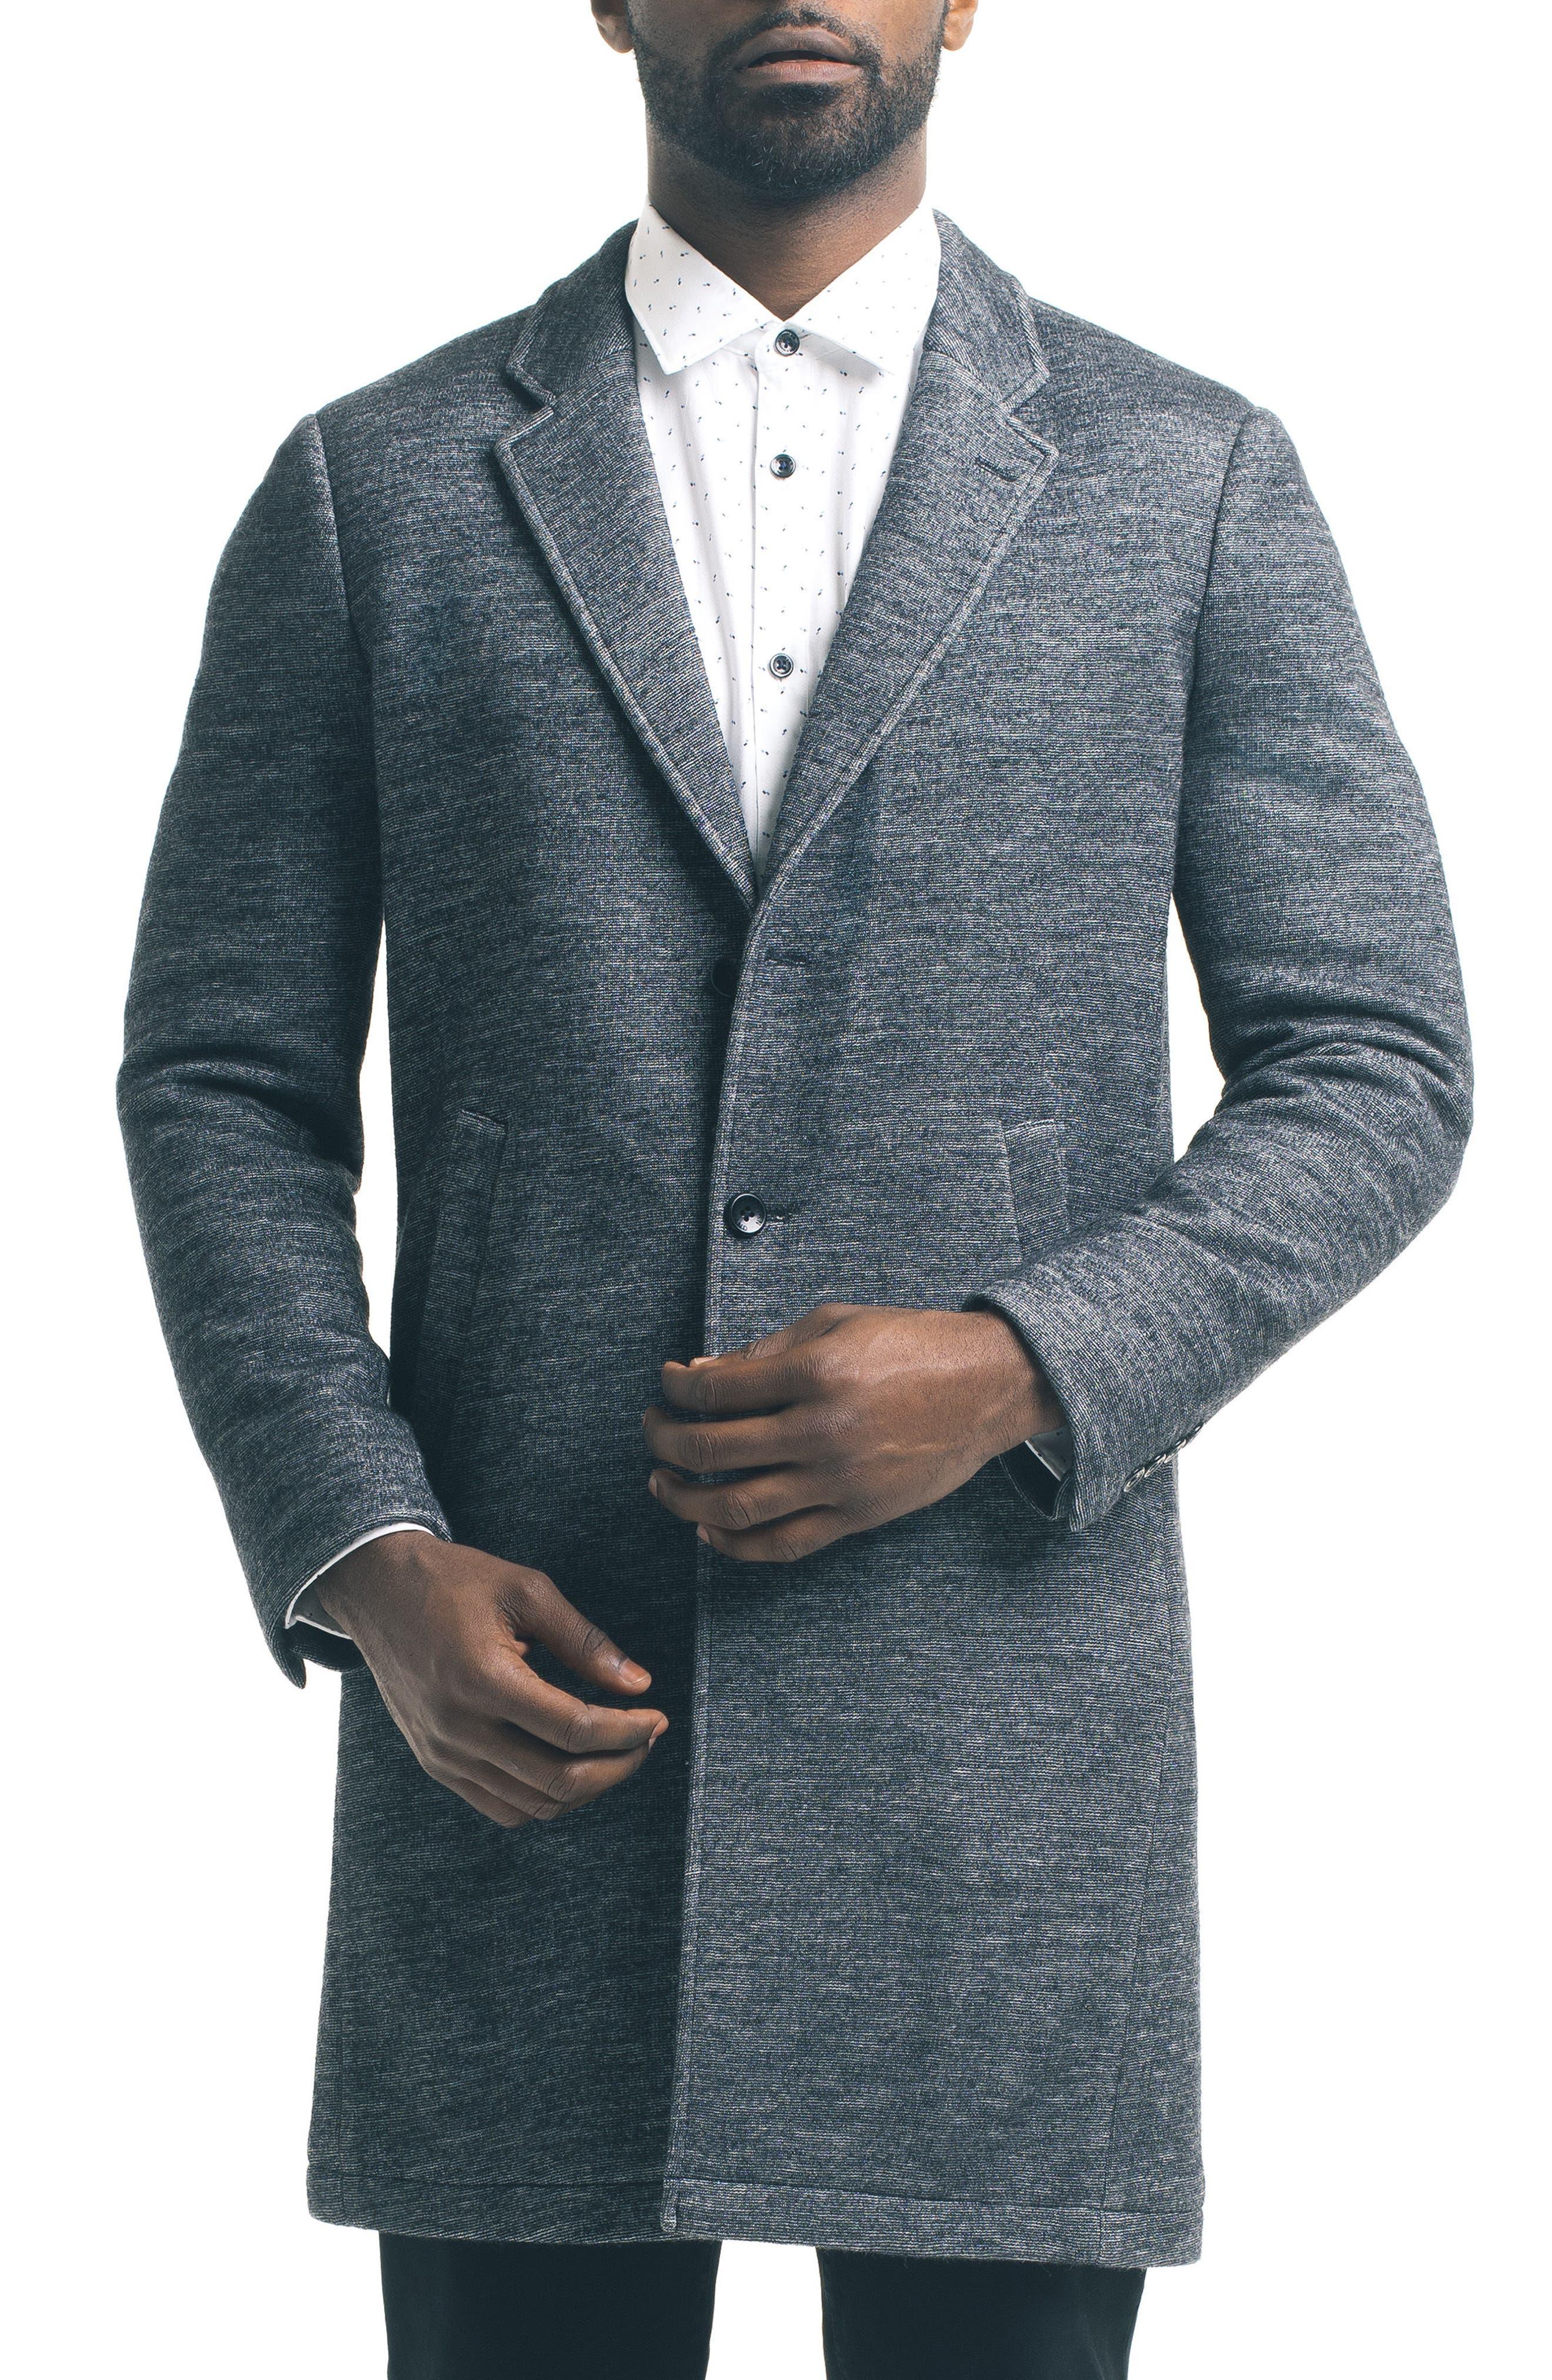 Good Man Brand Chesterfield Slim Jacket